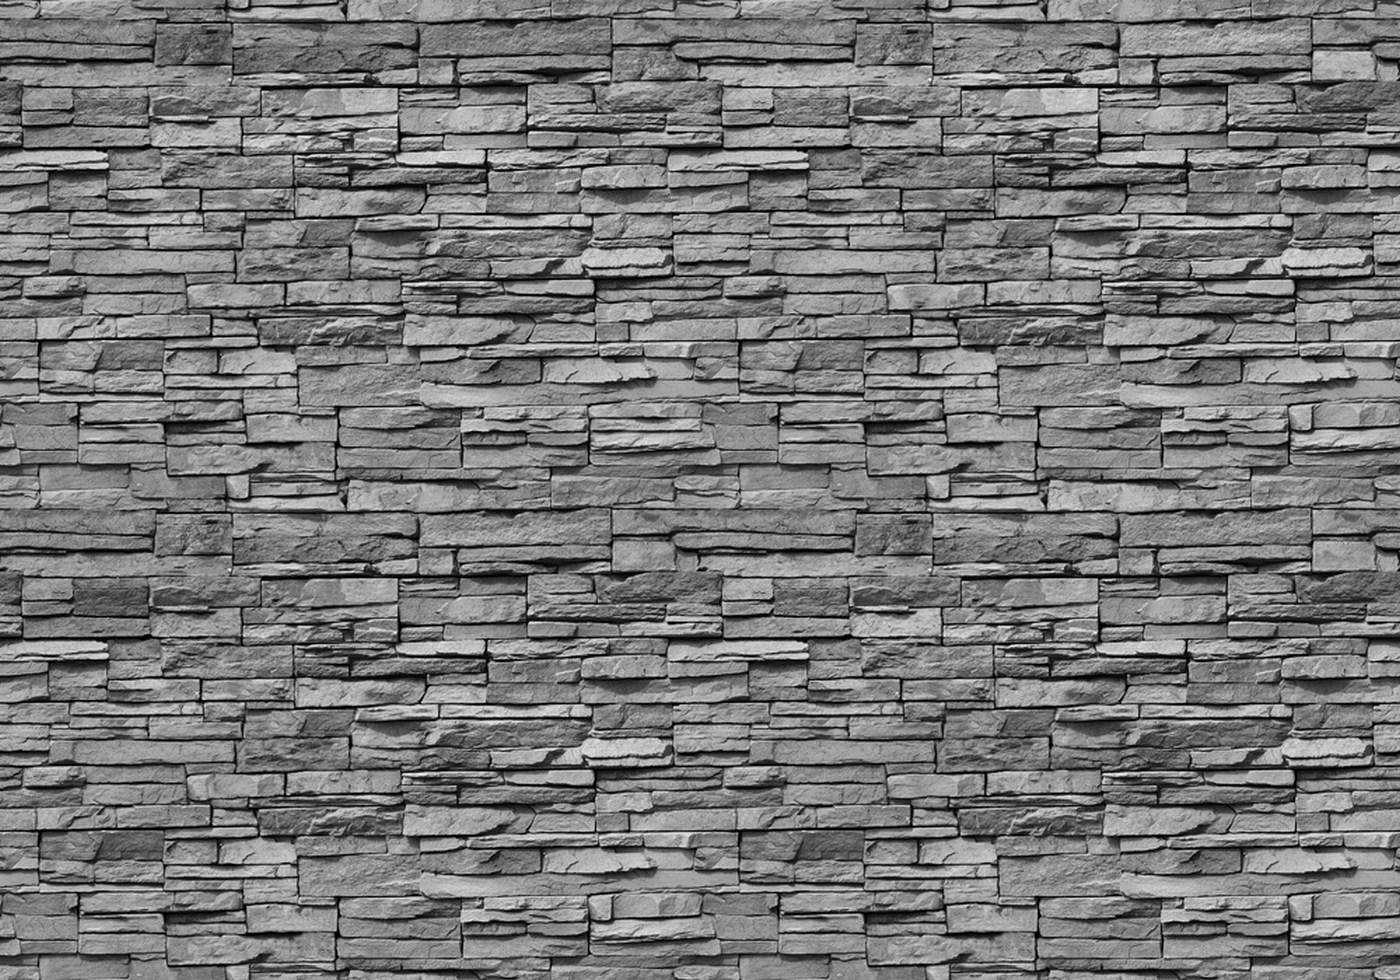 Vlies Fototapete 138 - Asian Stone Wall 2 - anreihbar Steinwand Tapete  Steinoptik Stein Steine Wand Wall anthrazit